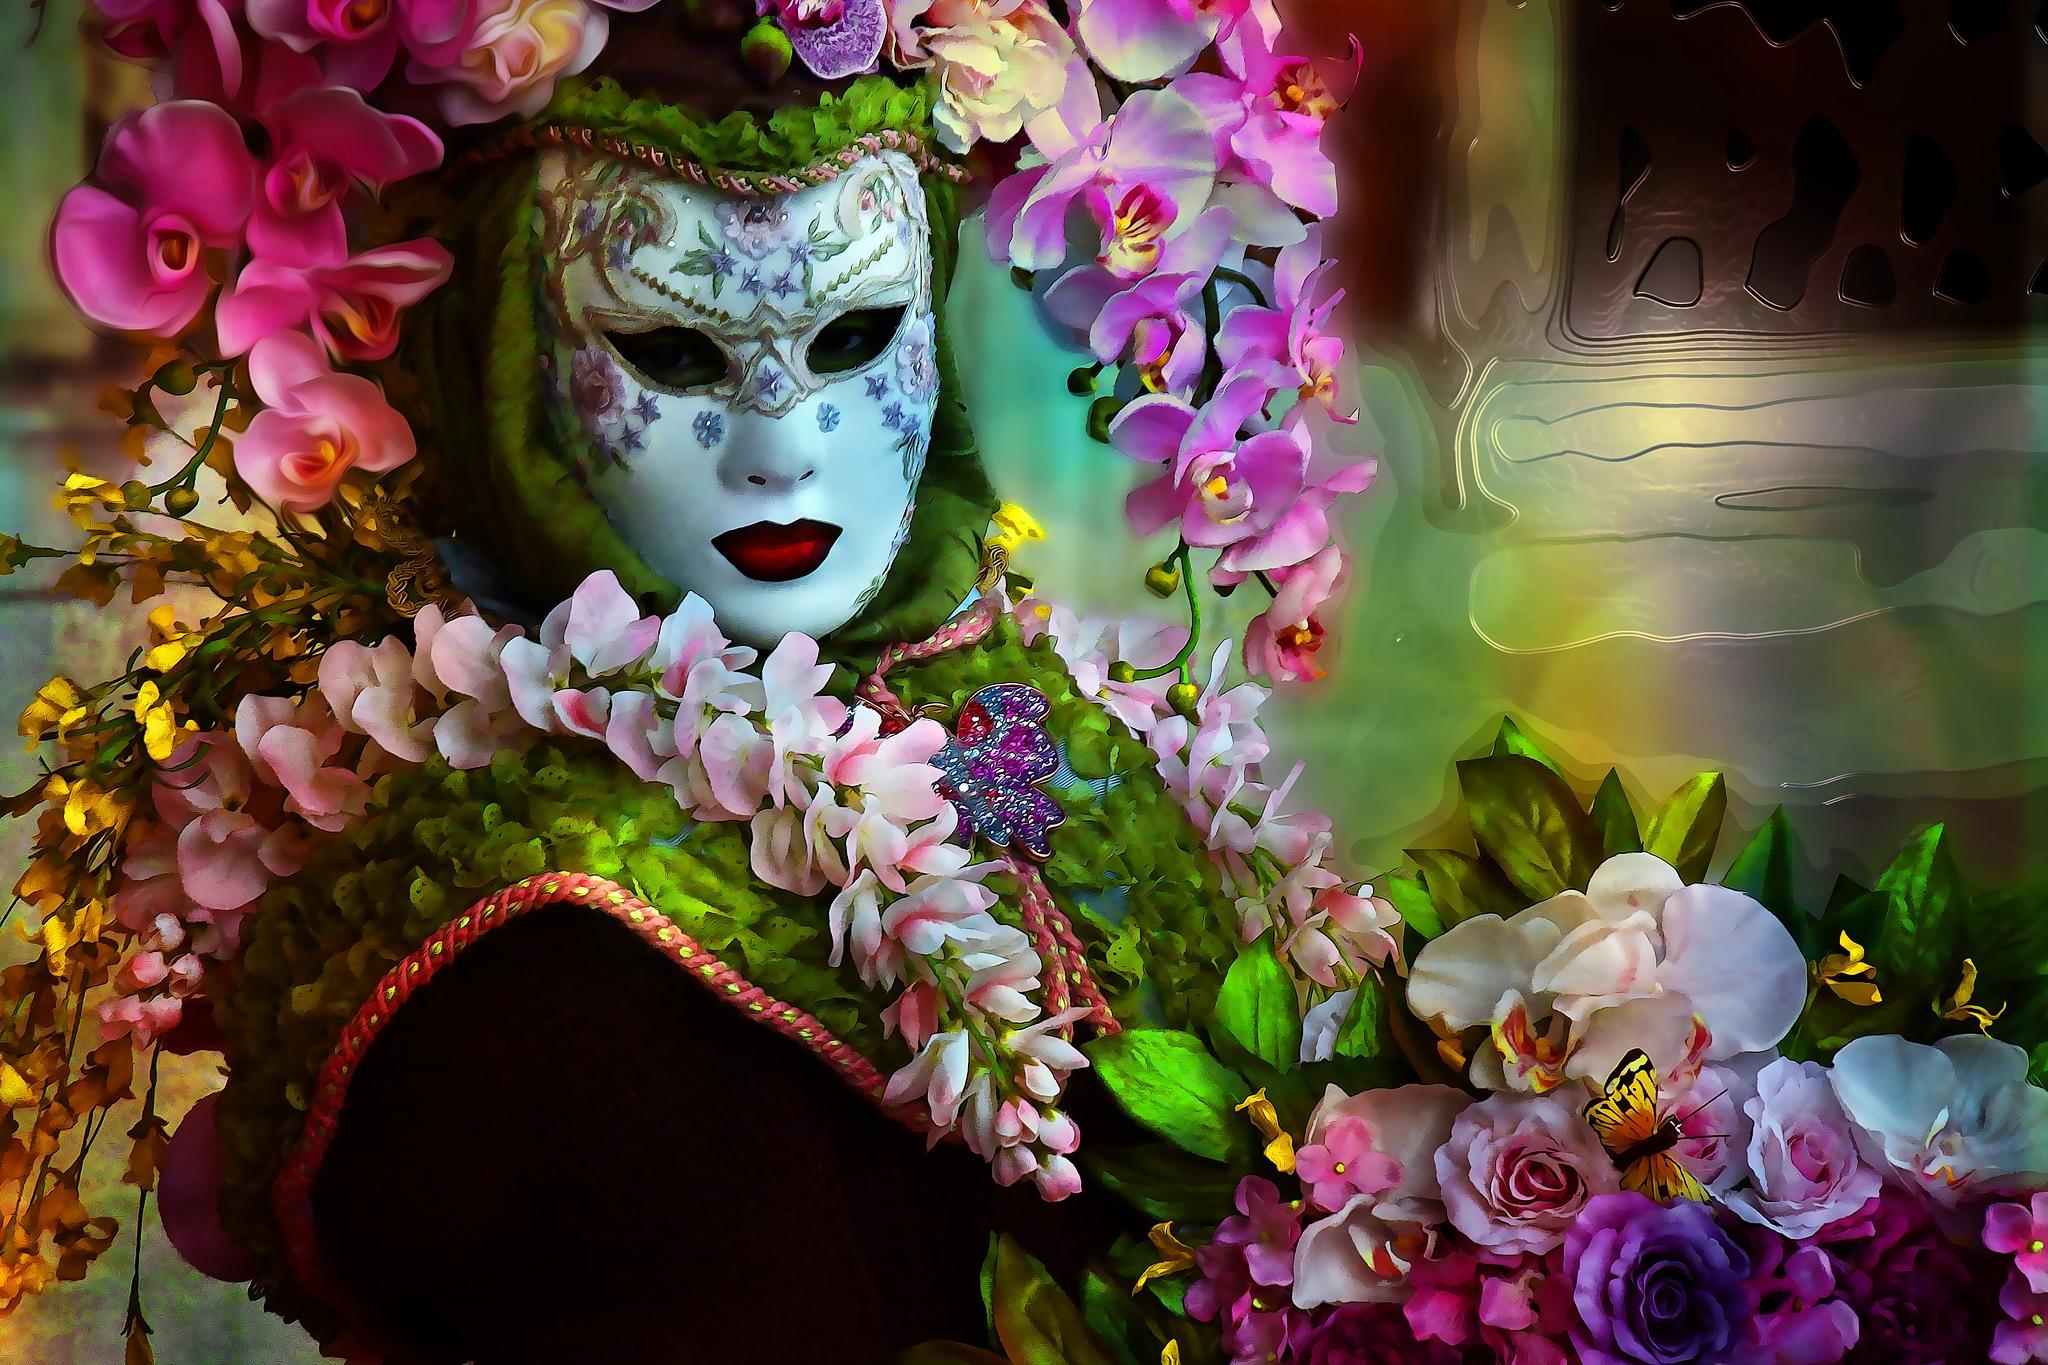 Venezia Carnevale by william.giacomini